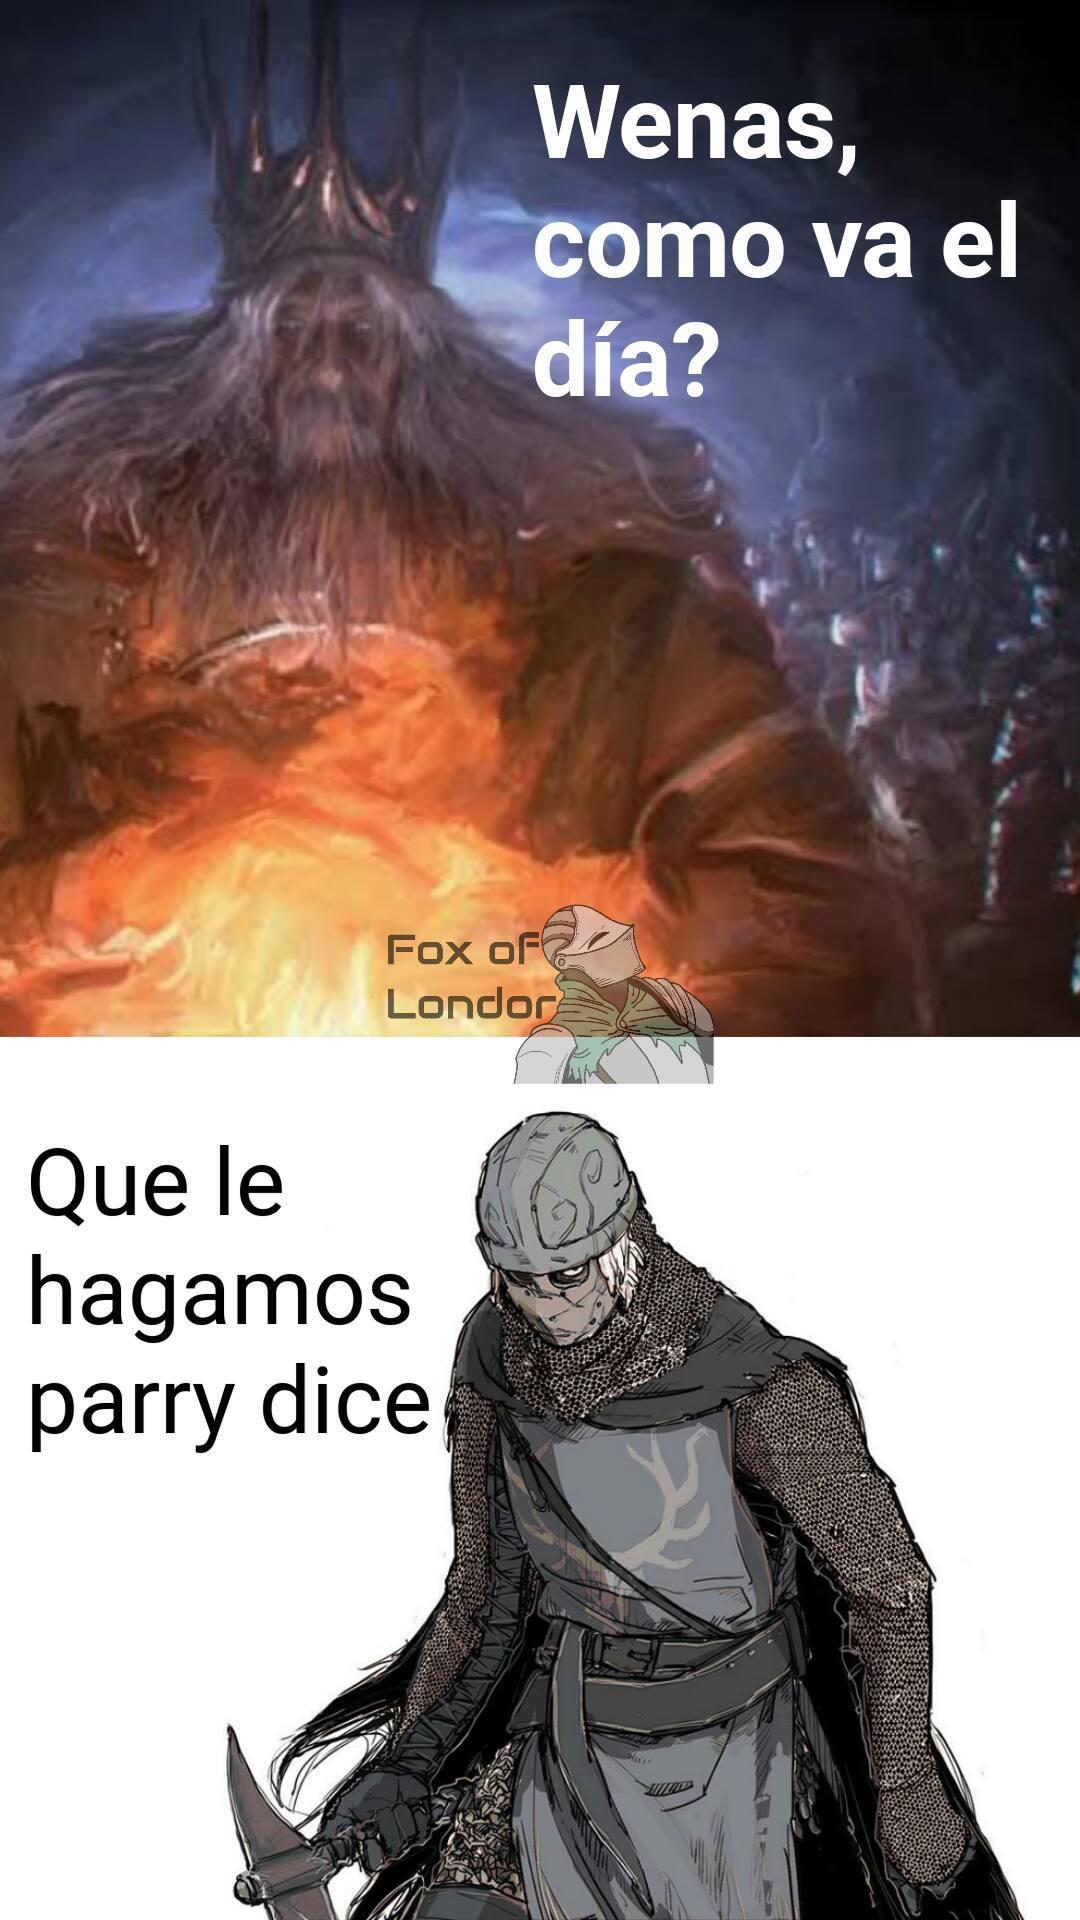 Piña colada pls - meme